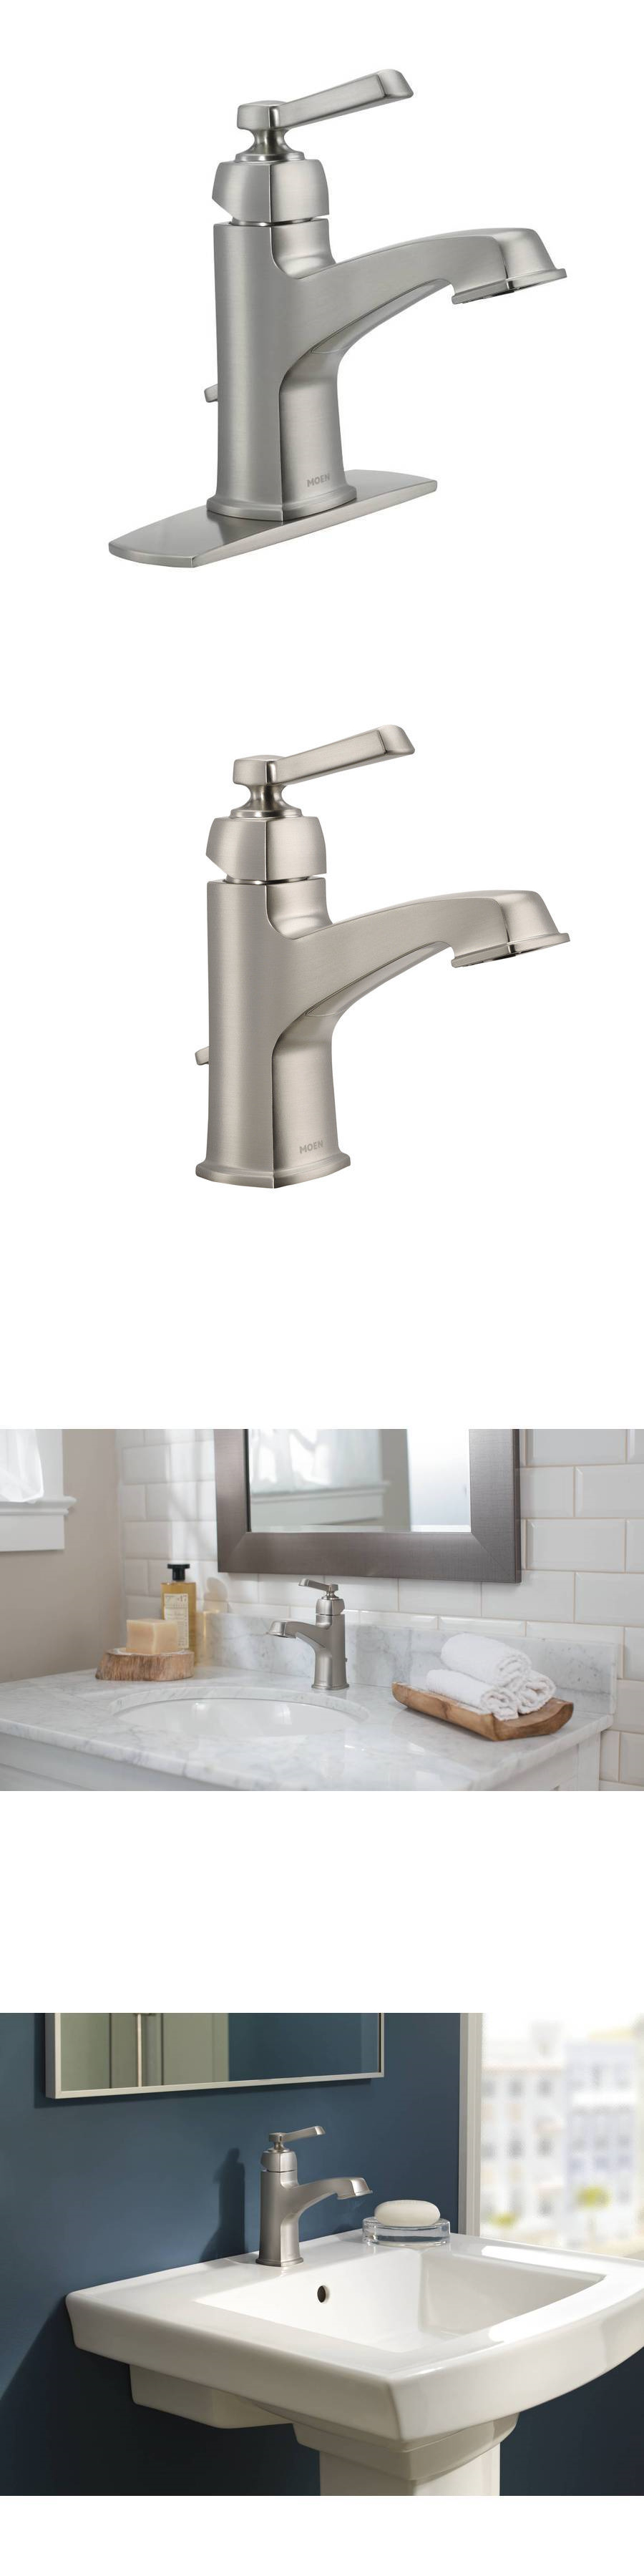 Faucets 42024 Moen Boardwalk Brushed Nickel 1 Handle Single Hole